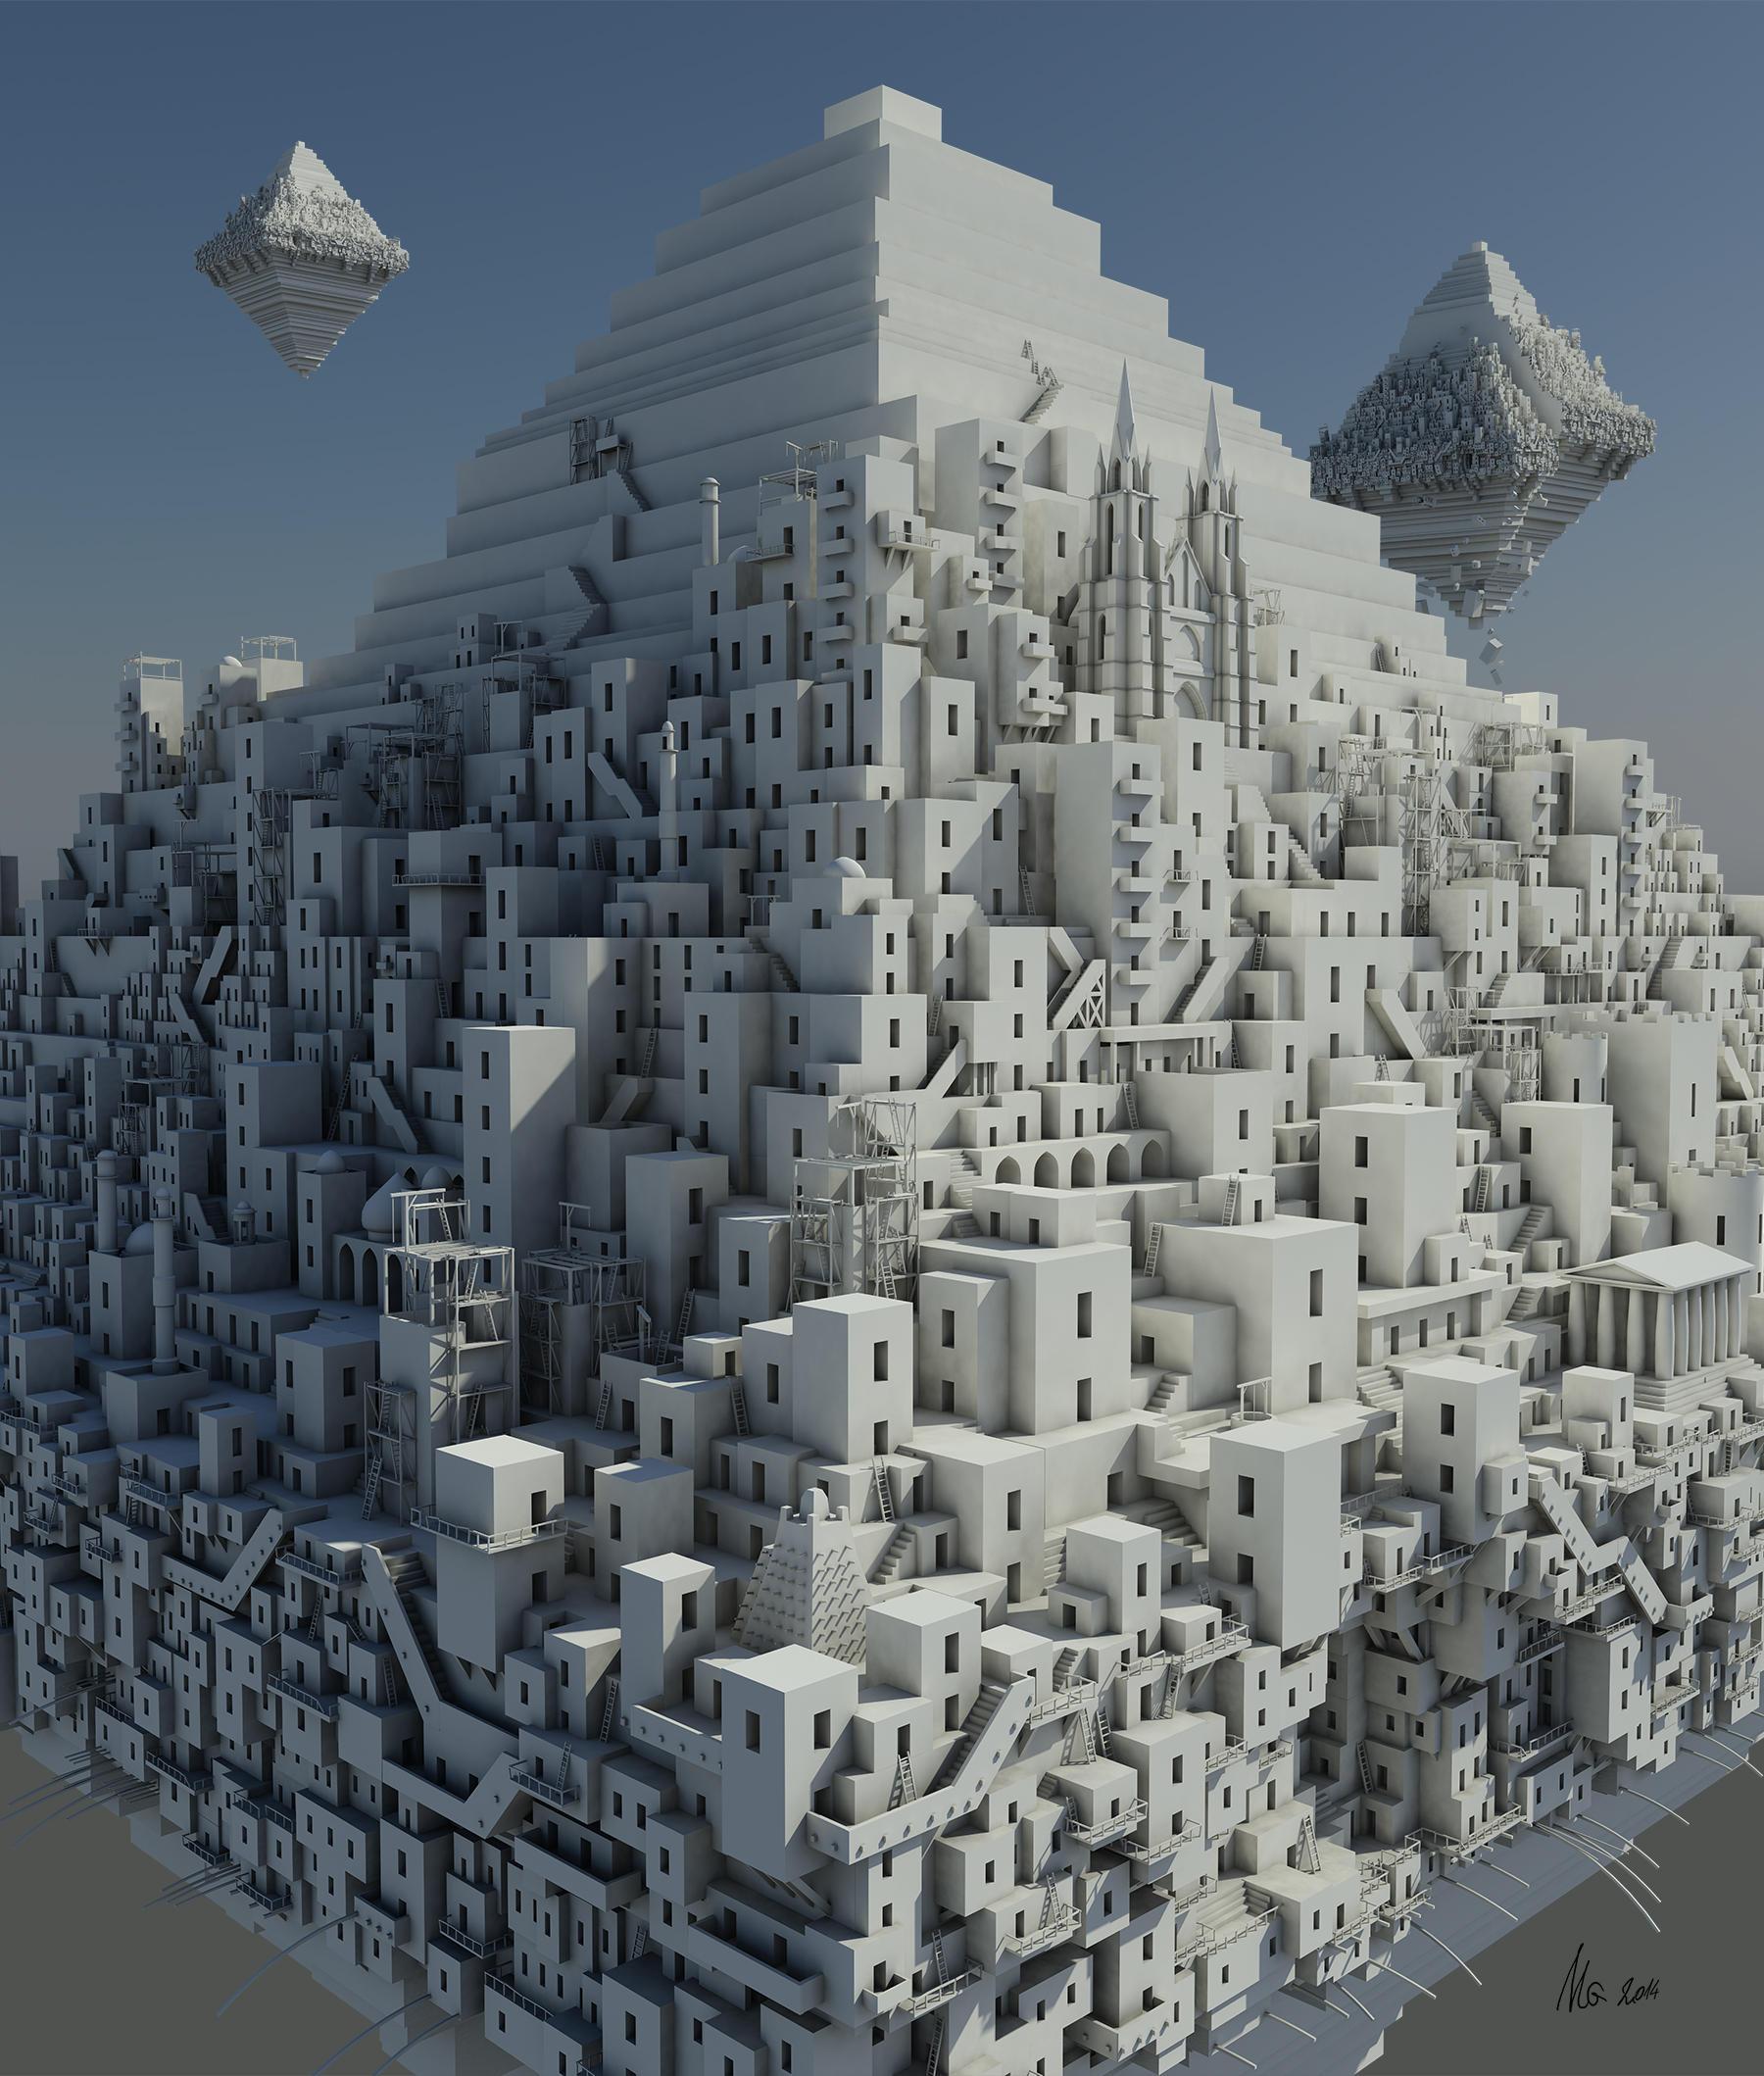 Babylon by spawn00000